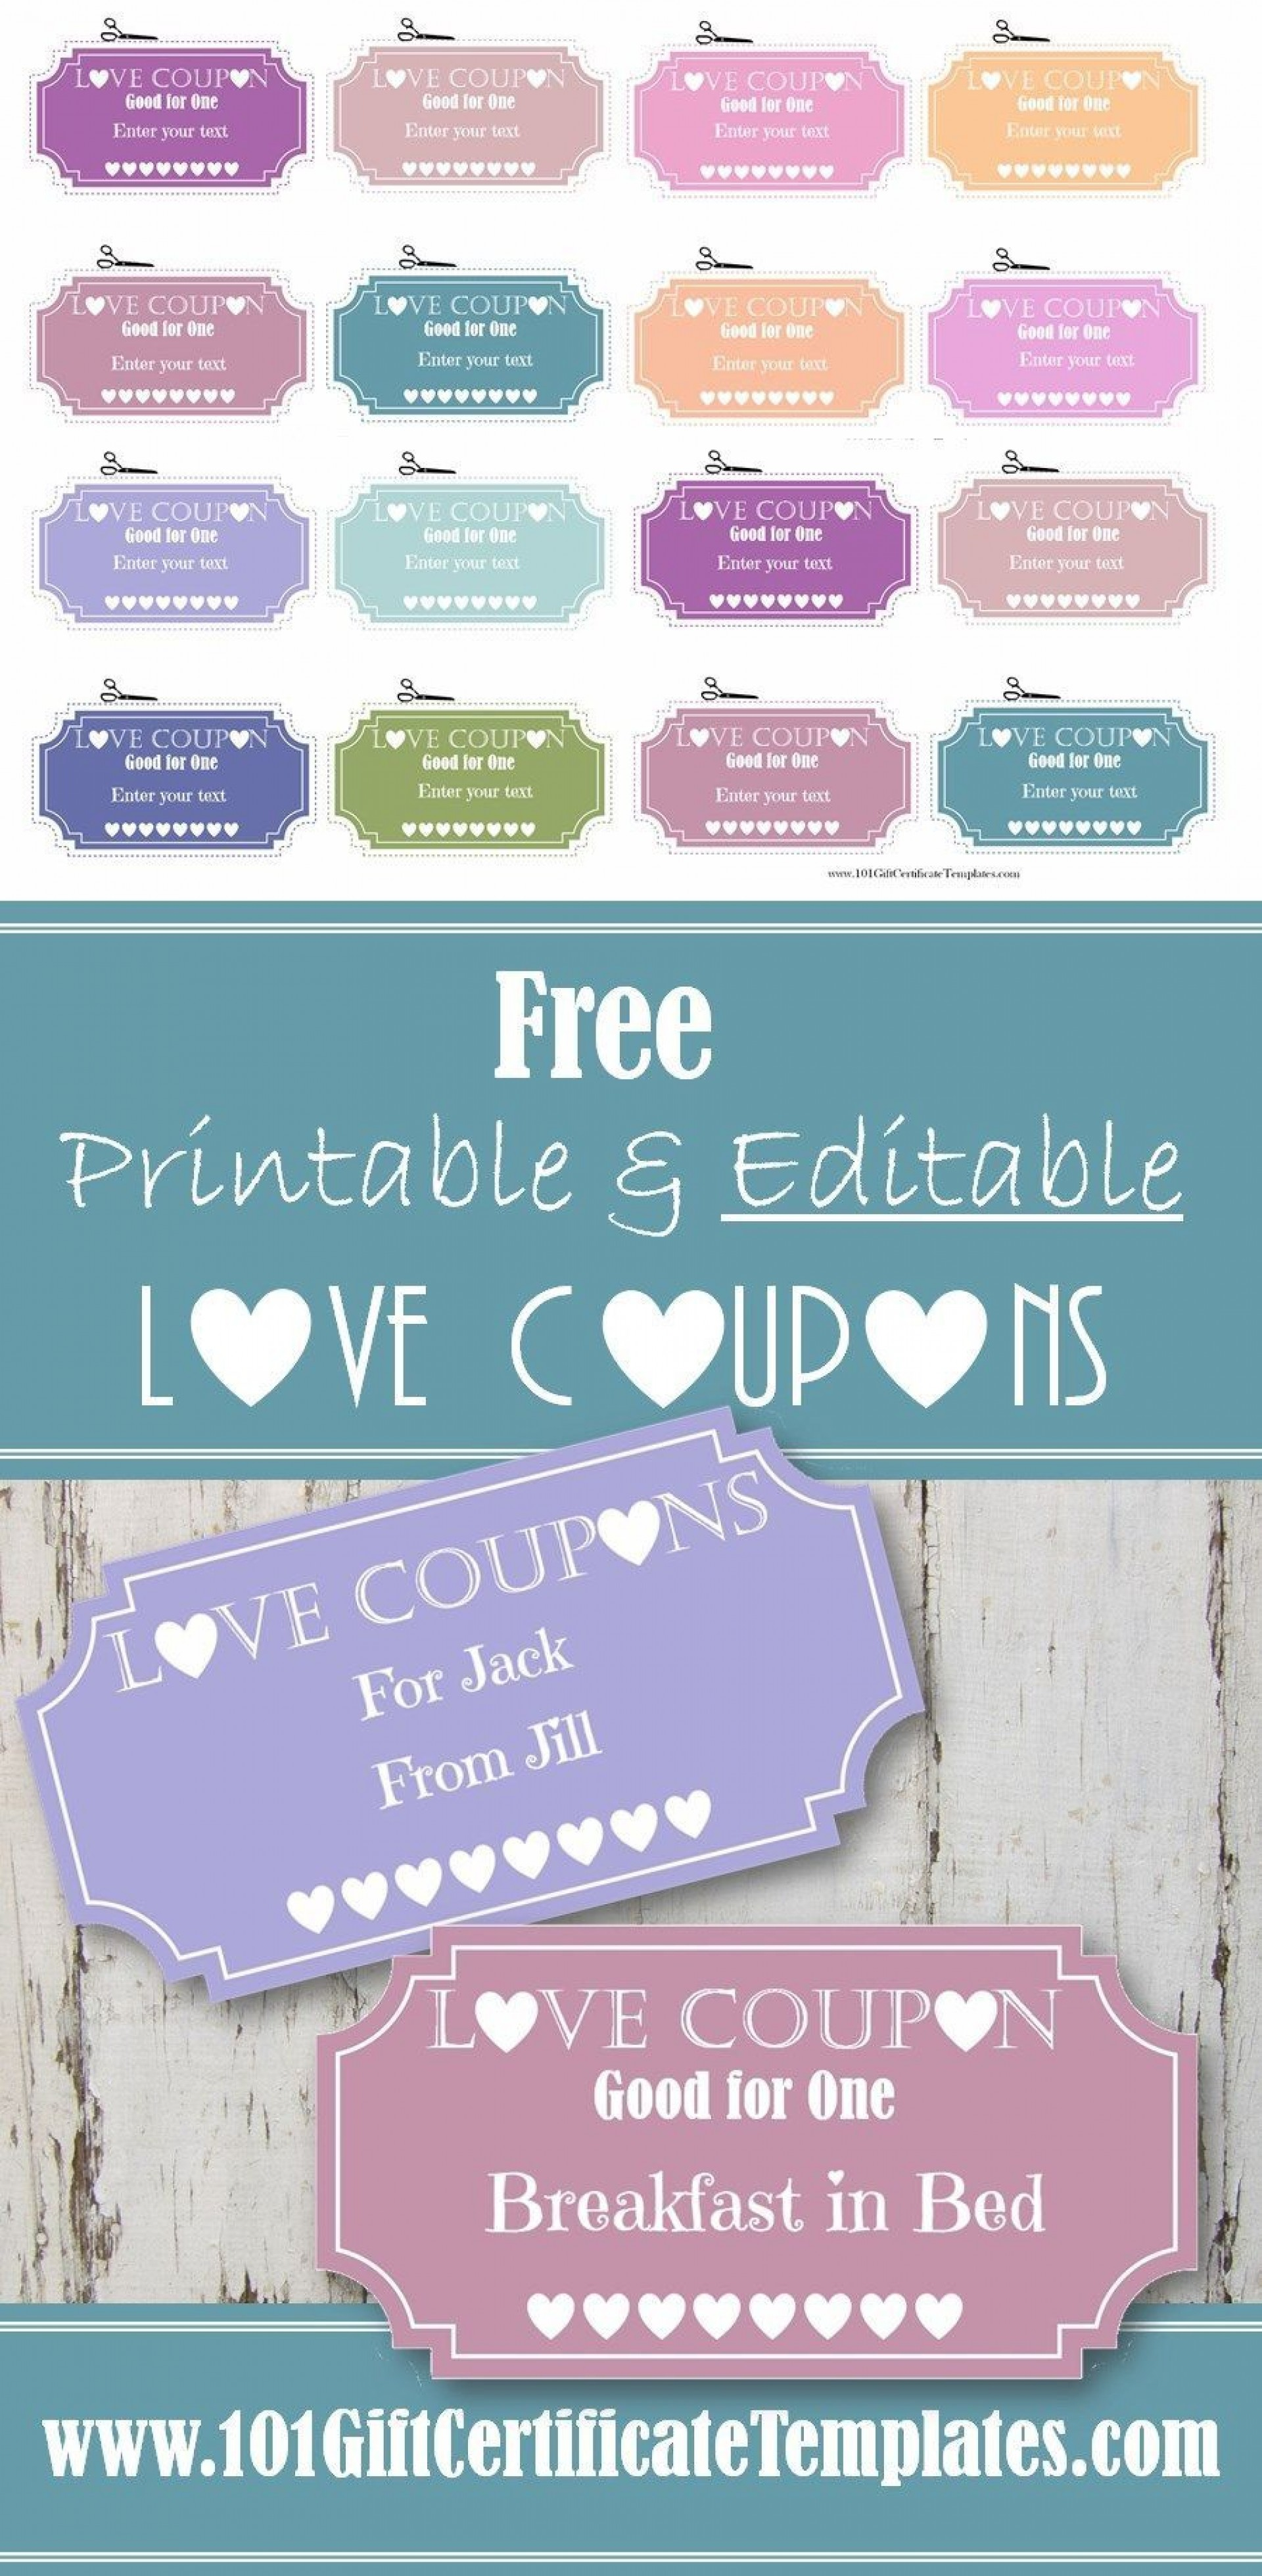 Free Printable Coupon Templates Addictionary